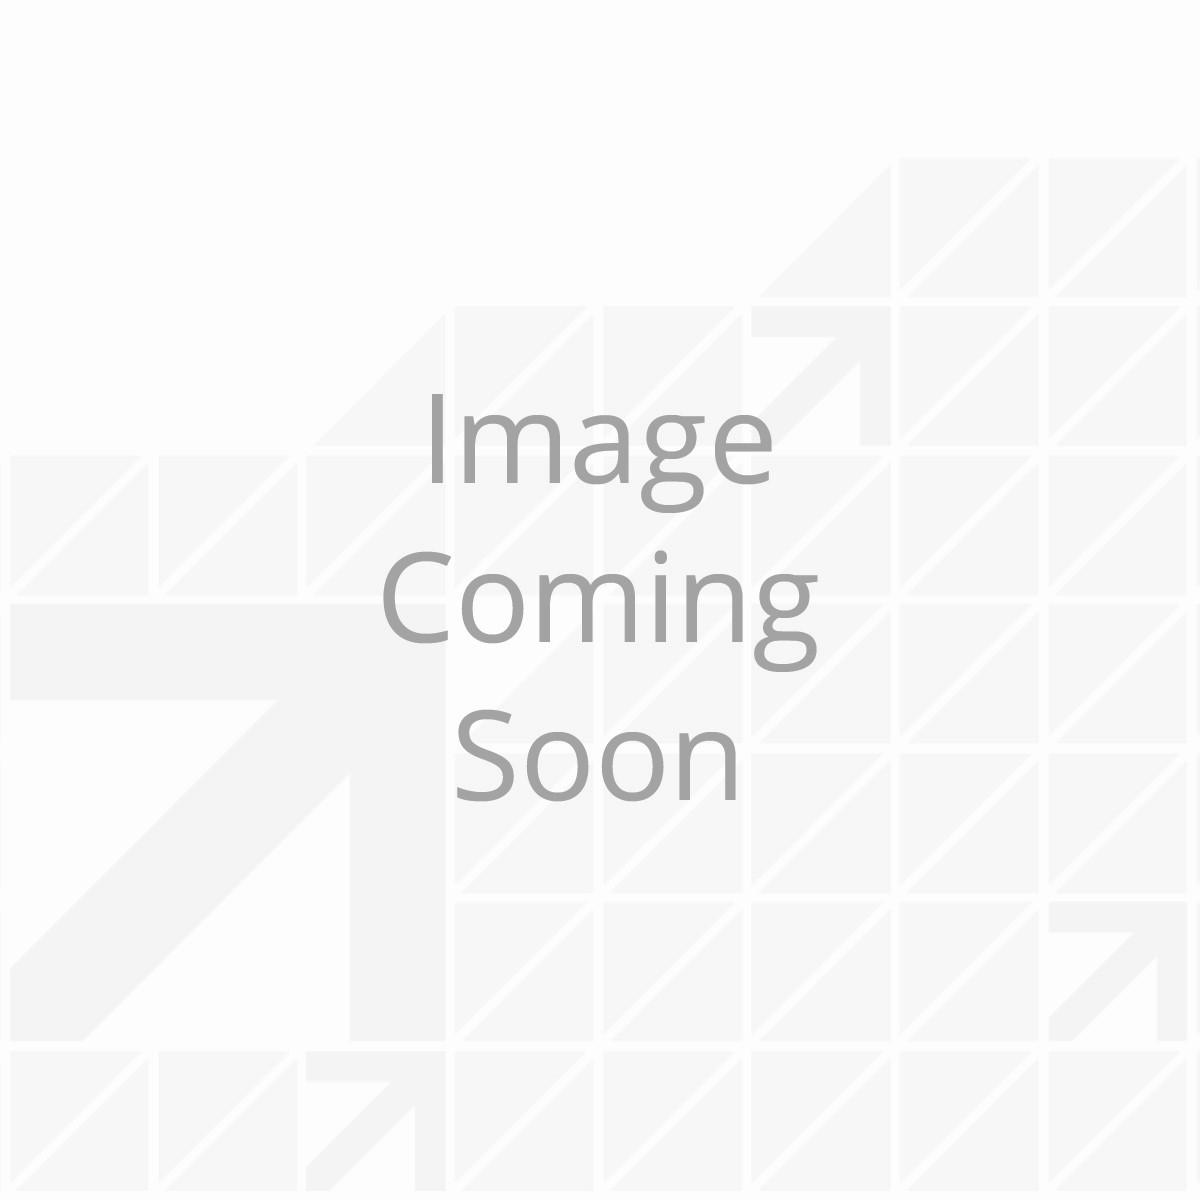 Forward Self-Adjusting Brakes - Various Options